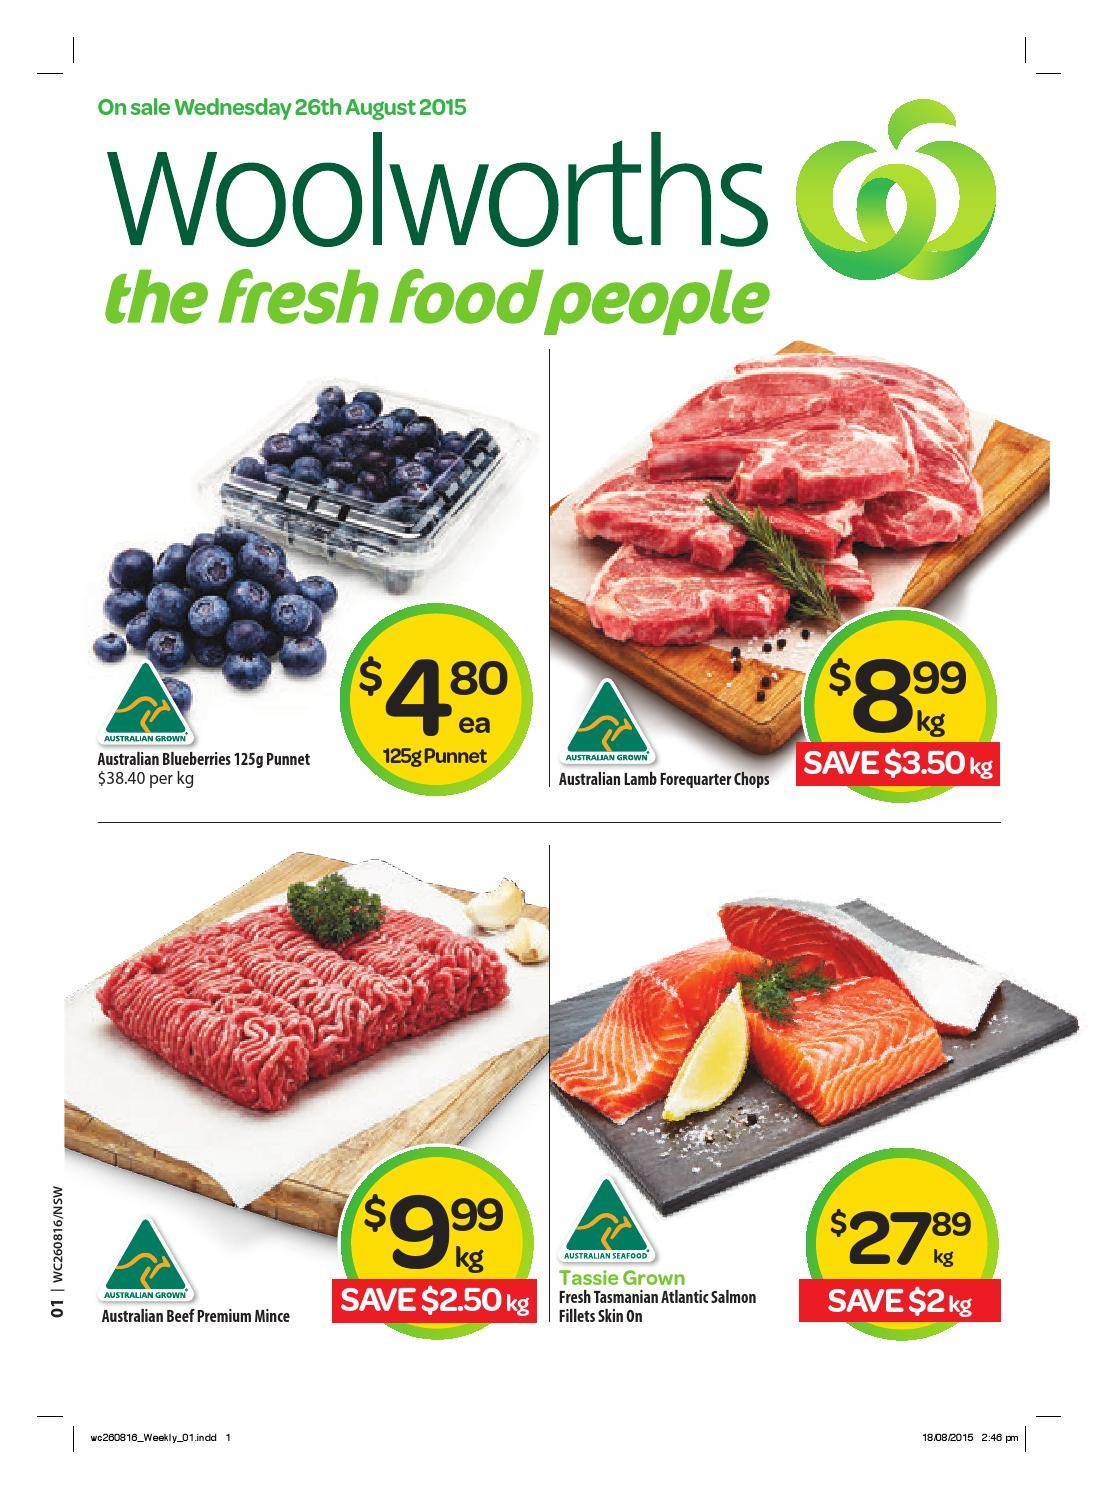 Nsw Woolworths 260815 010915 By Hojunara Issuu Fancy Feast Grilled Tuna In Gravy 85g 6 Pcs Free Pouch